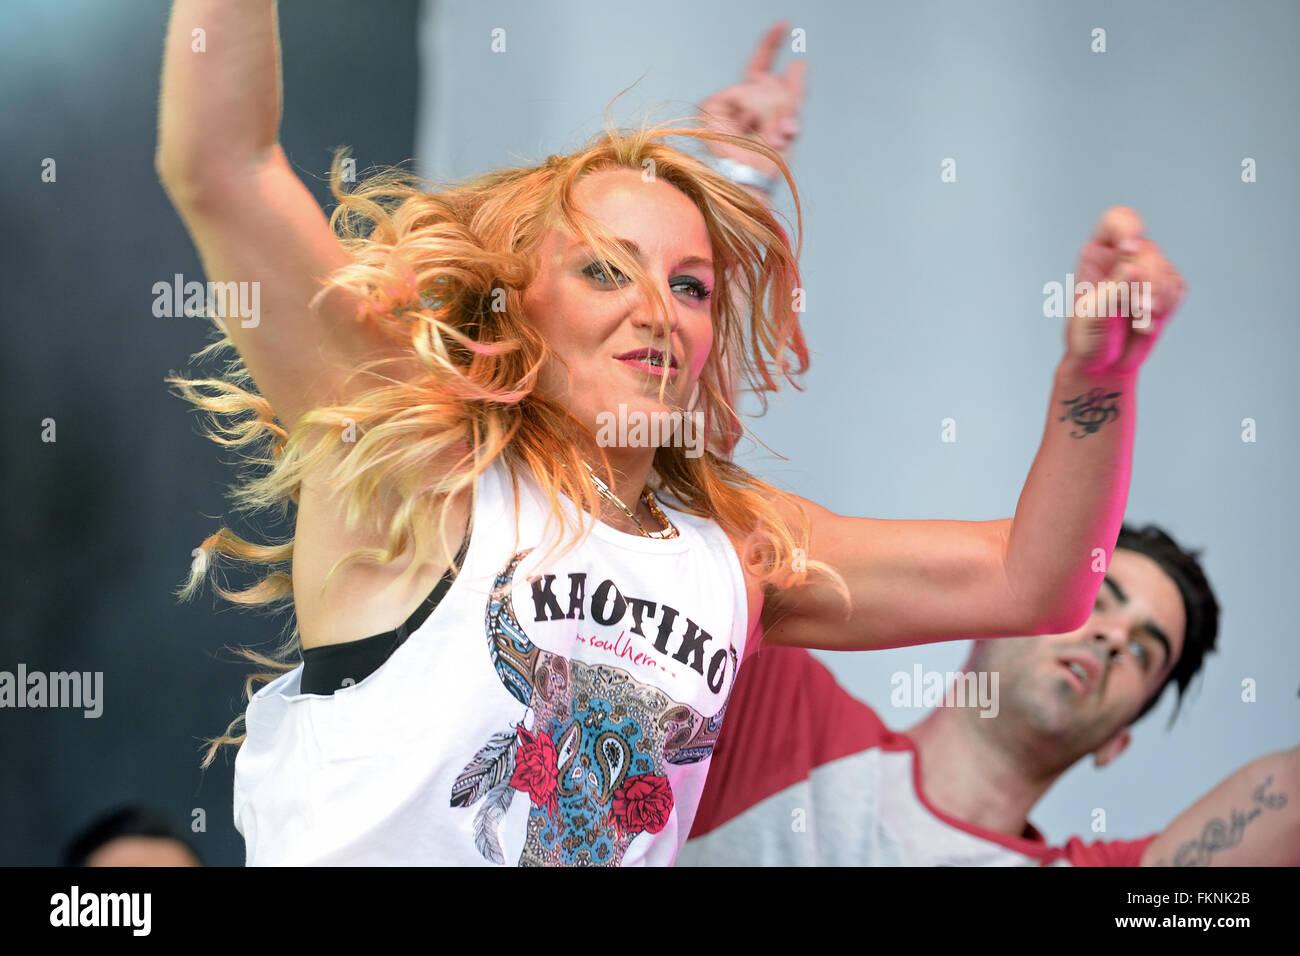 BARCELONA - MAY 23: Woman dancing a choreography at the Primavera Pop Festival of Badalona. - Stock Image